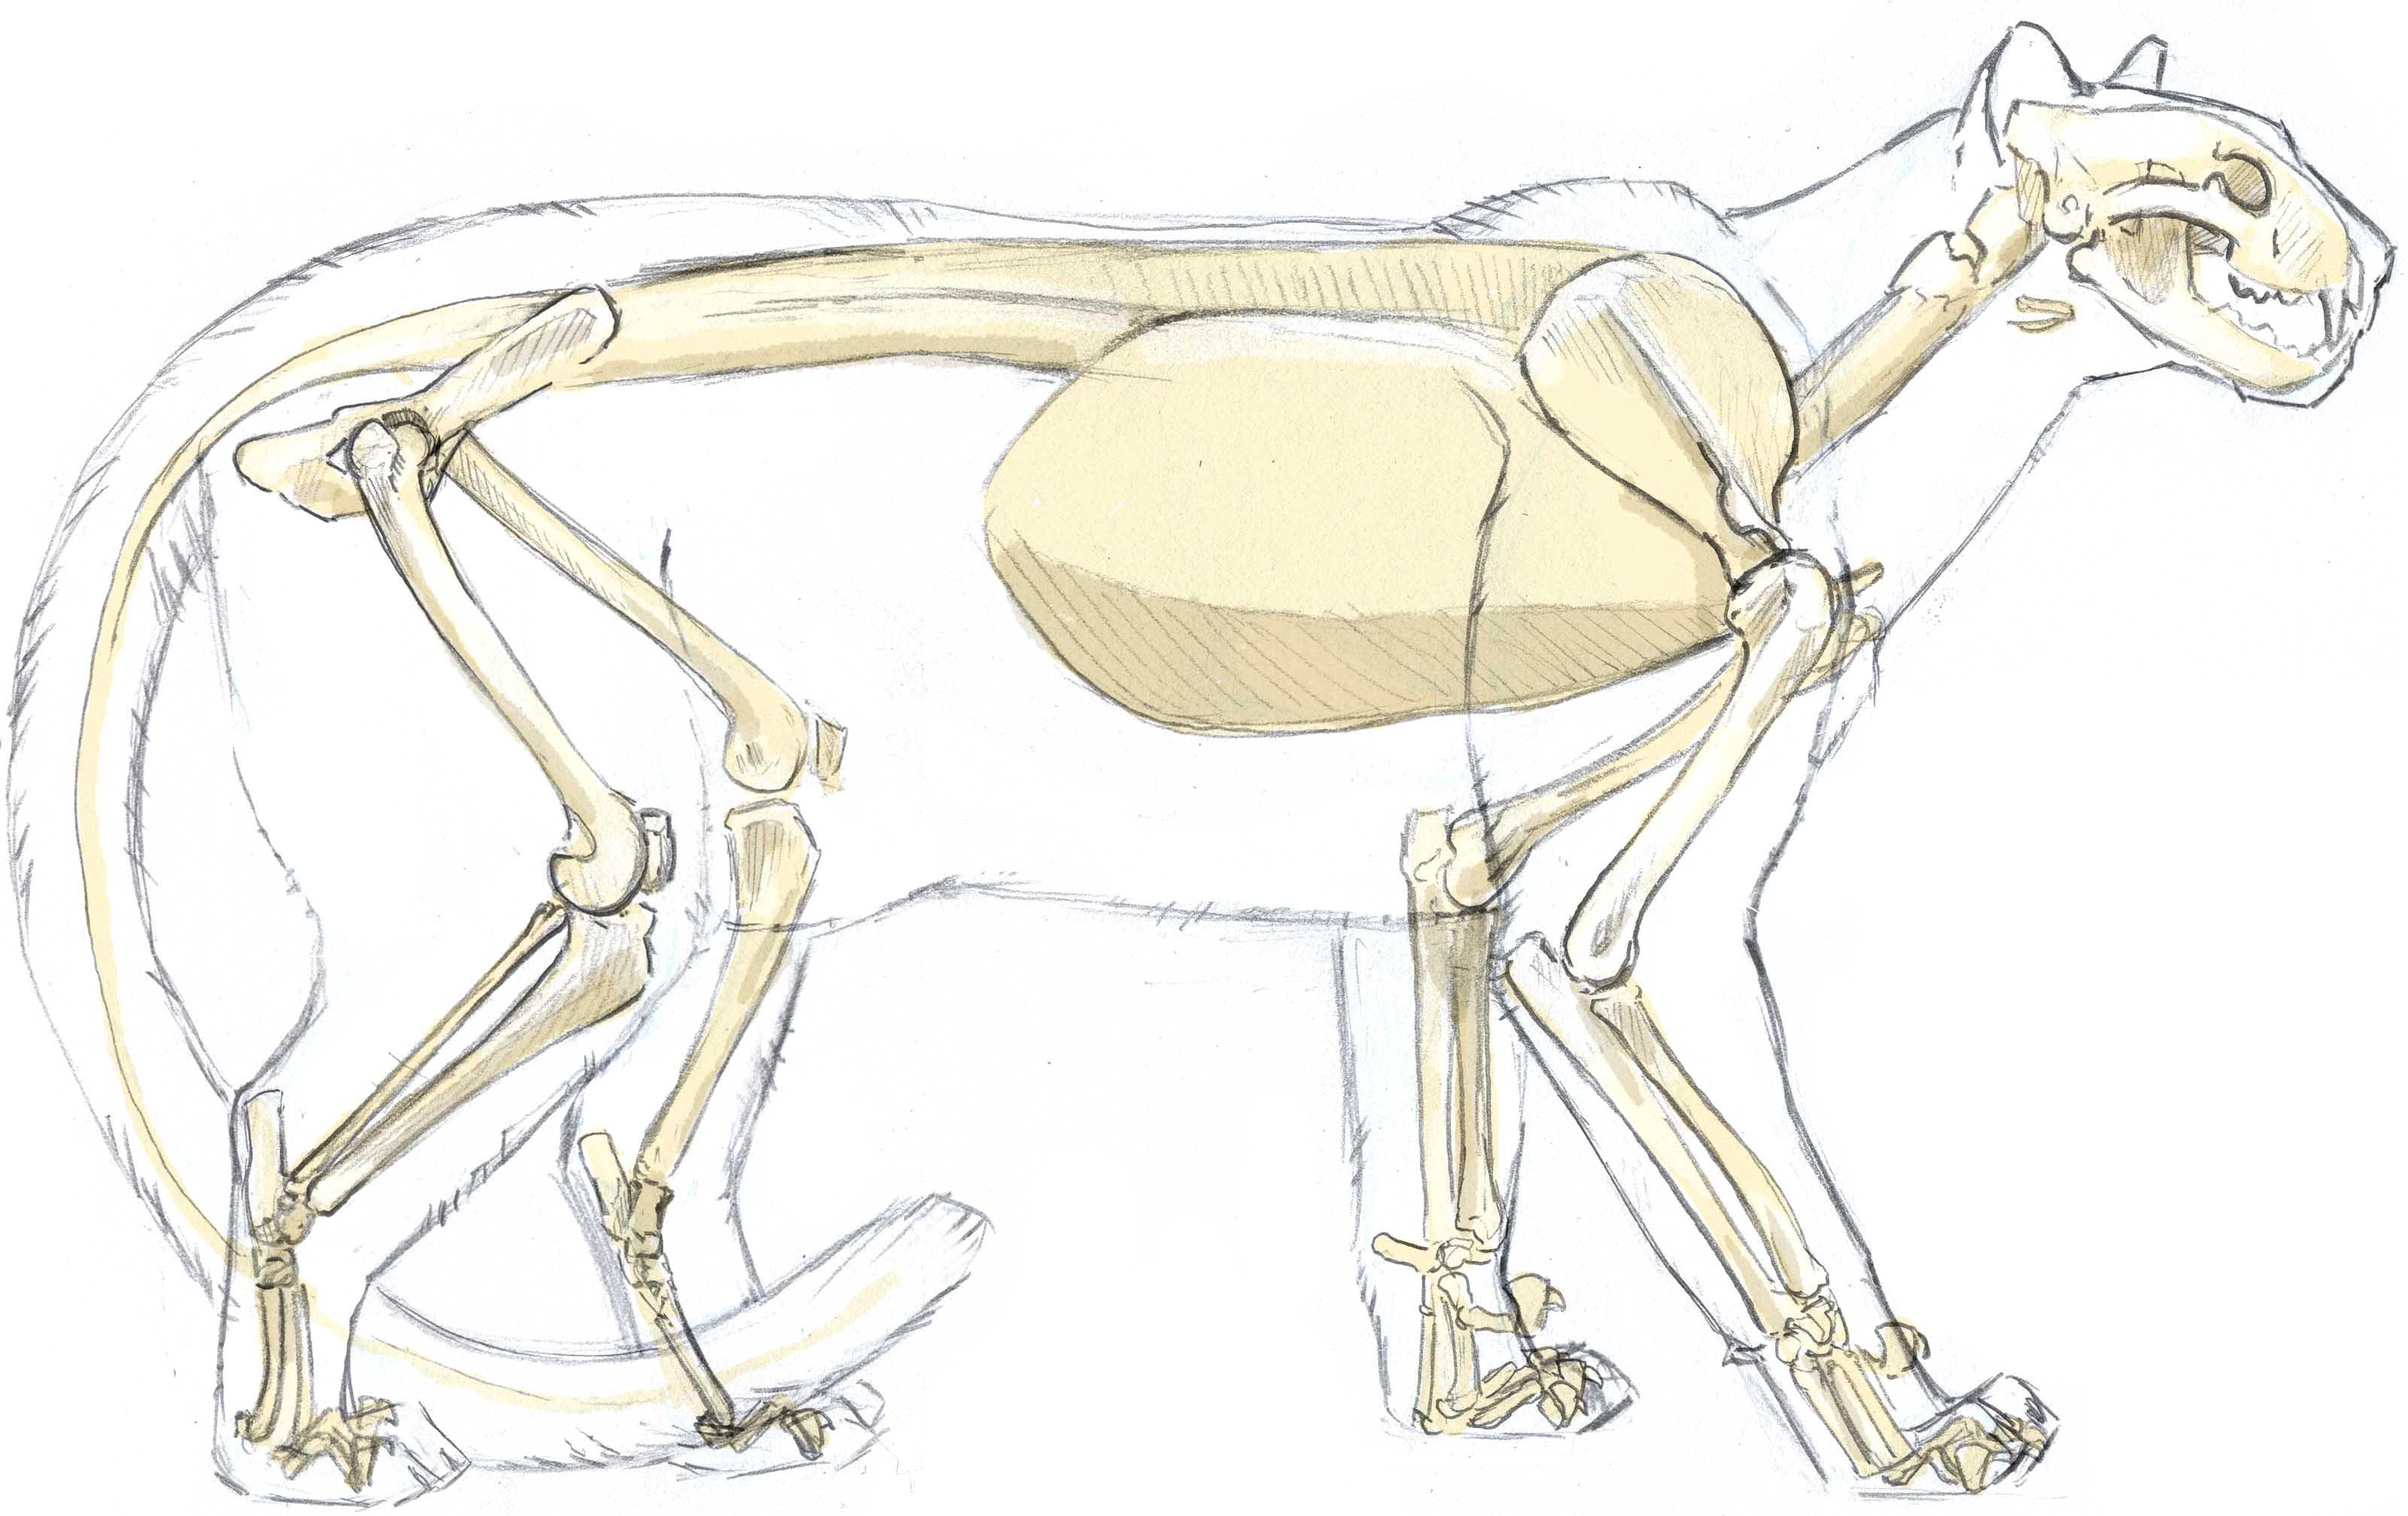 Mountain Lion Skull Diagram Coyote Skull - Wire Diagrams